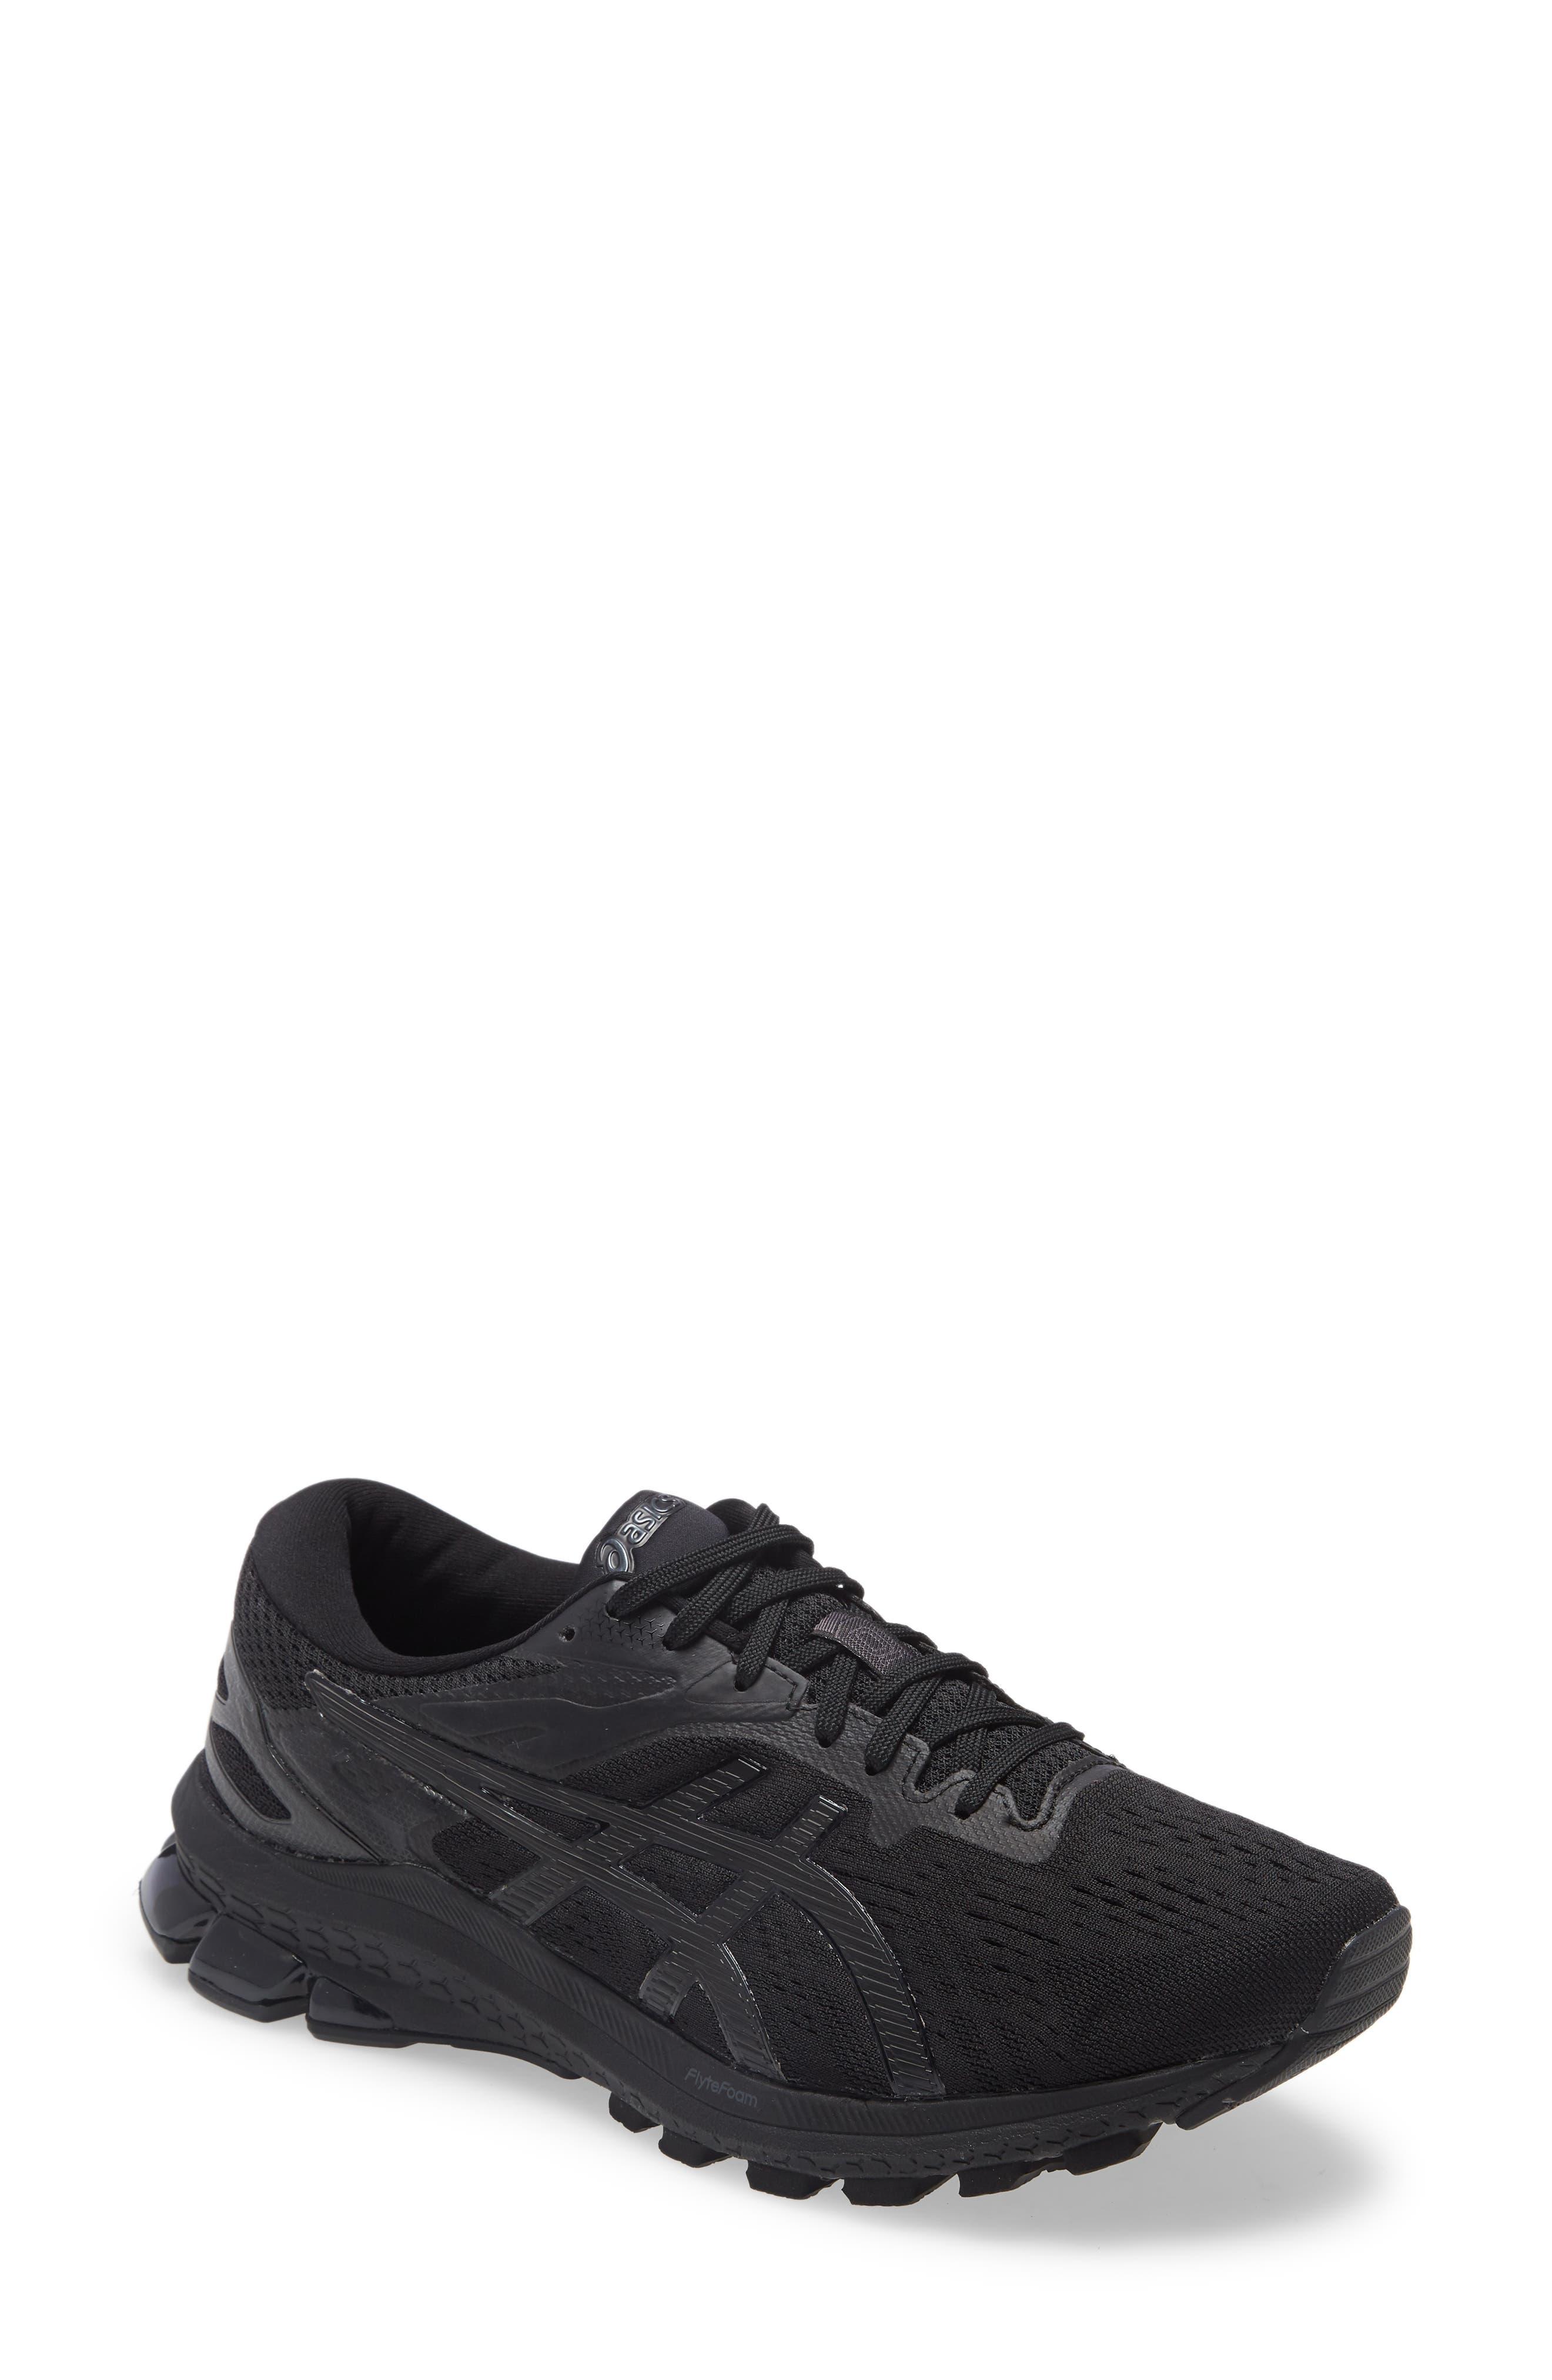 Women's Asics Gt-1000 10 Running Shoe